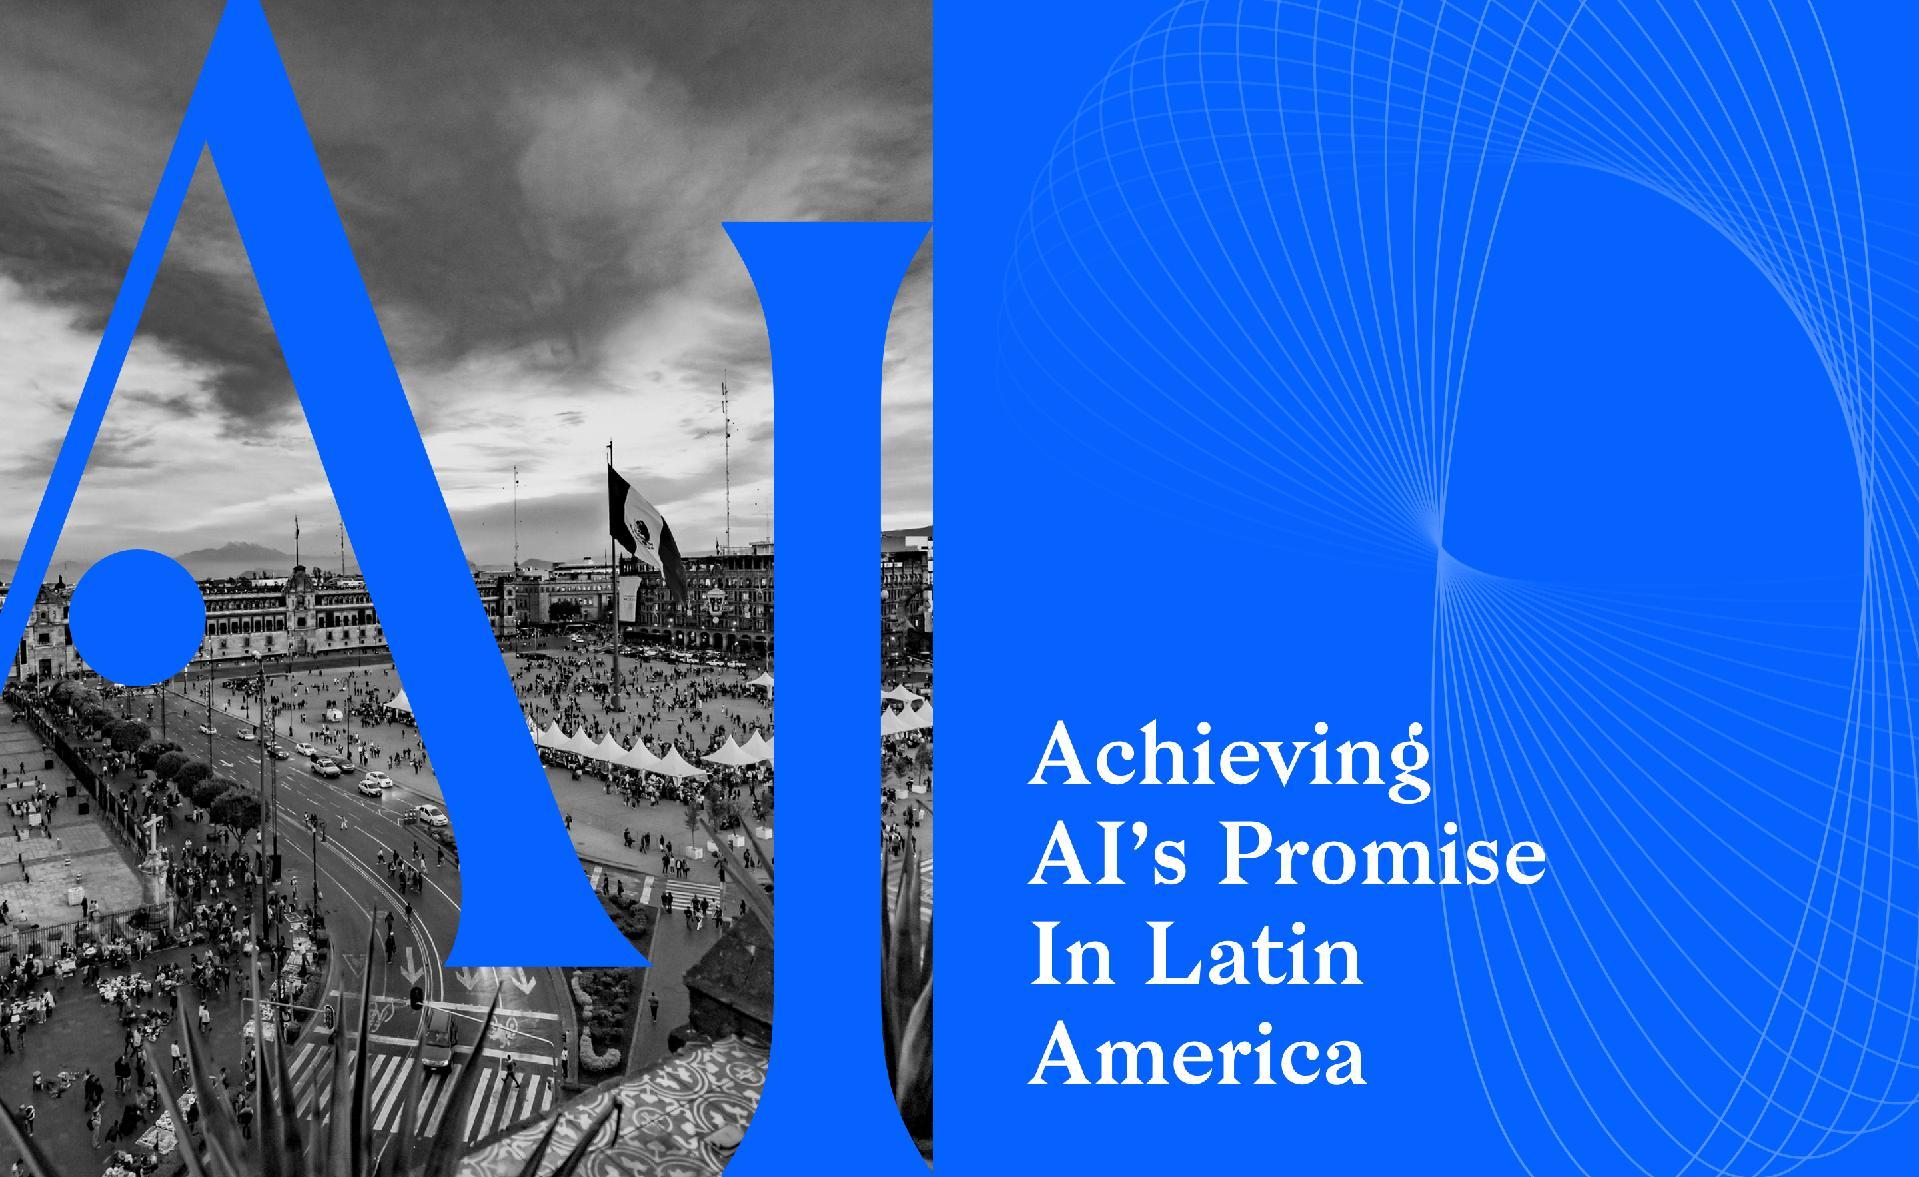 Achieving AI's Promise In Latin America